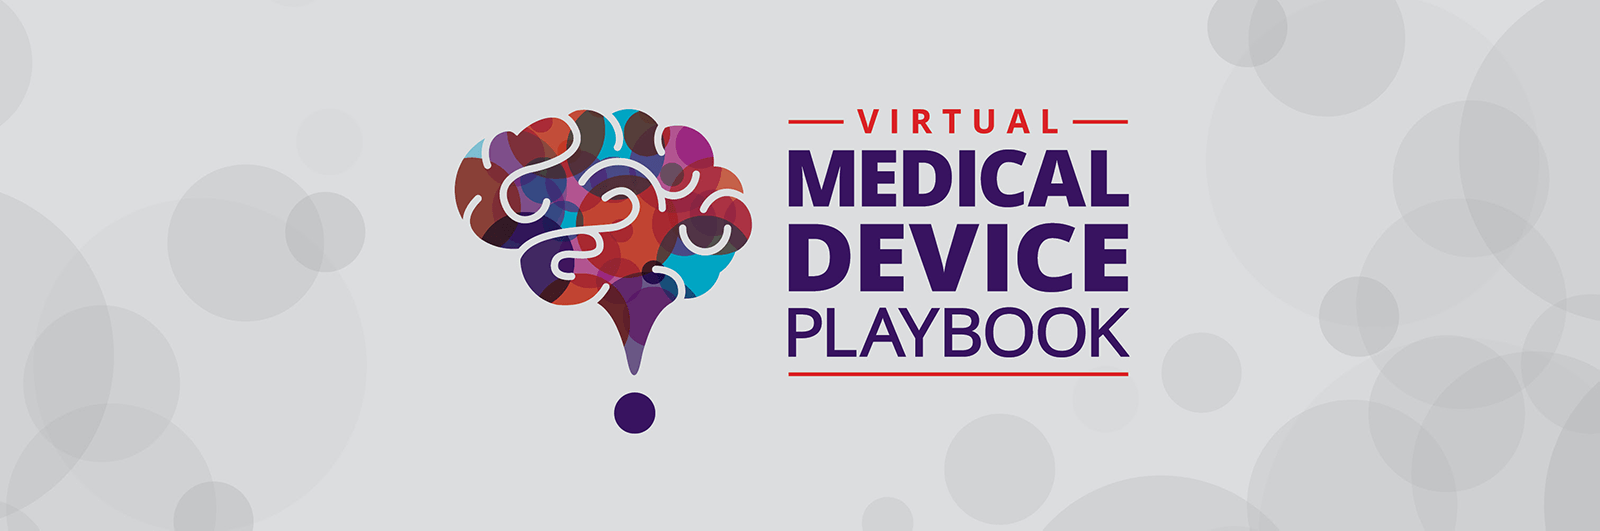 Virtual Medical Device Playbook